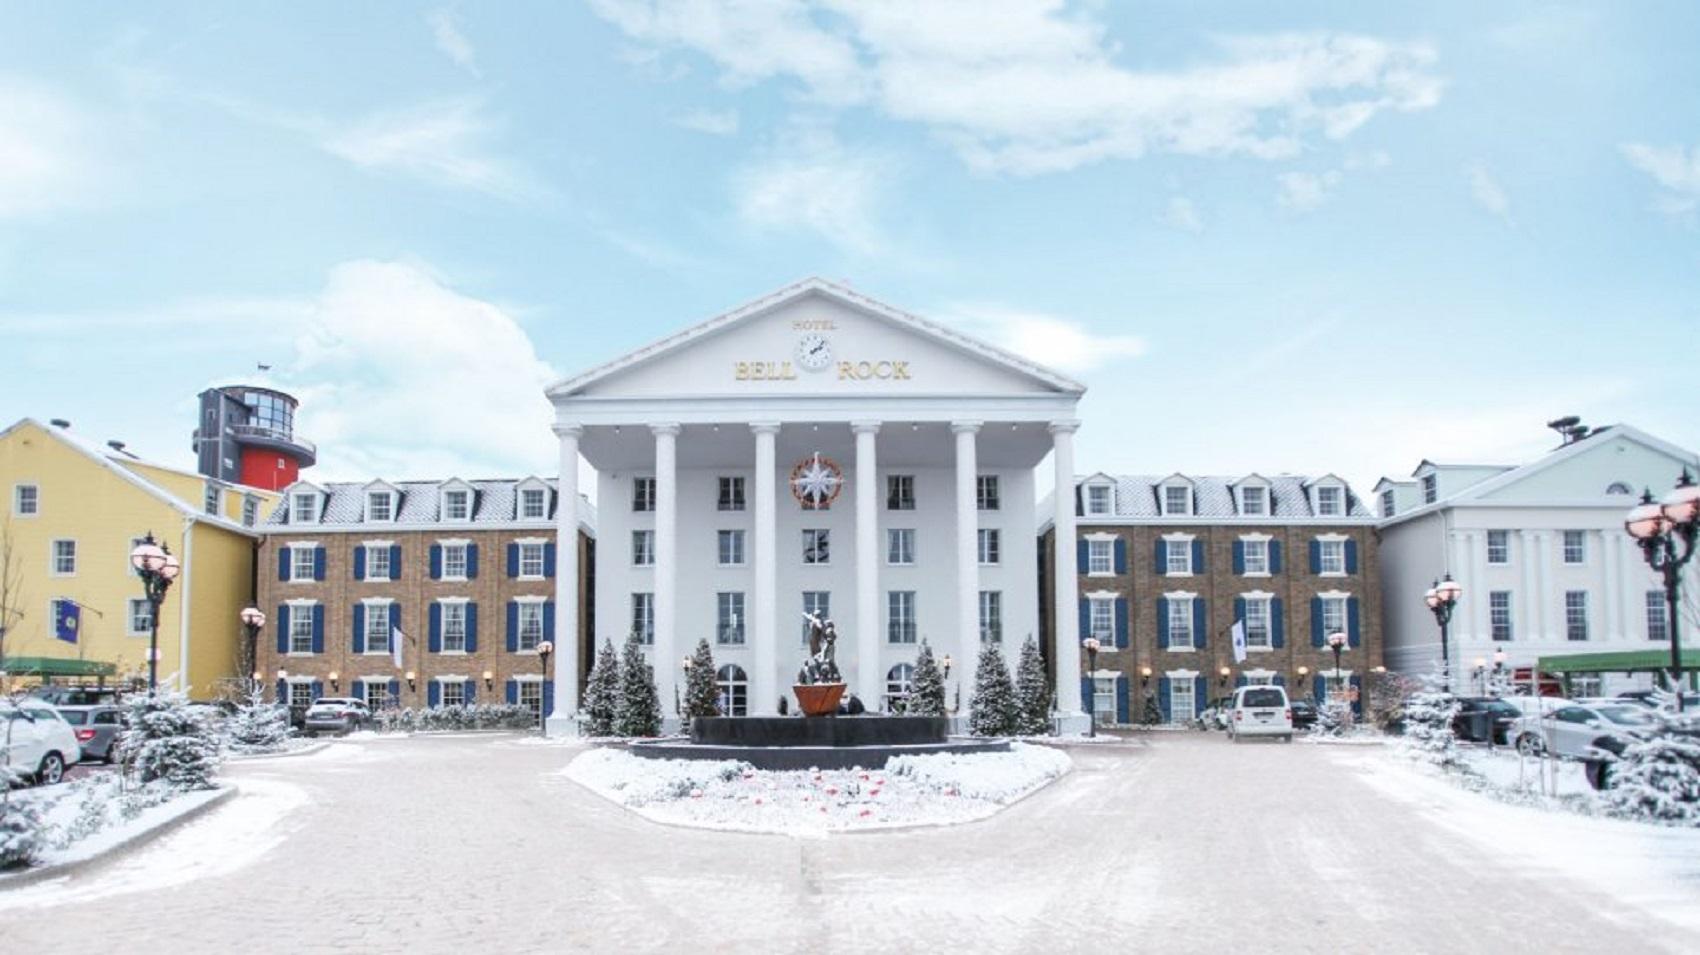 Europa-park-hotels